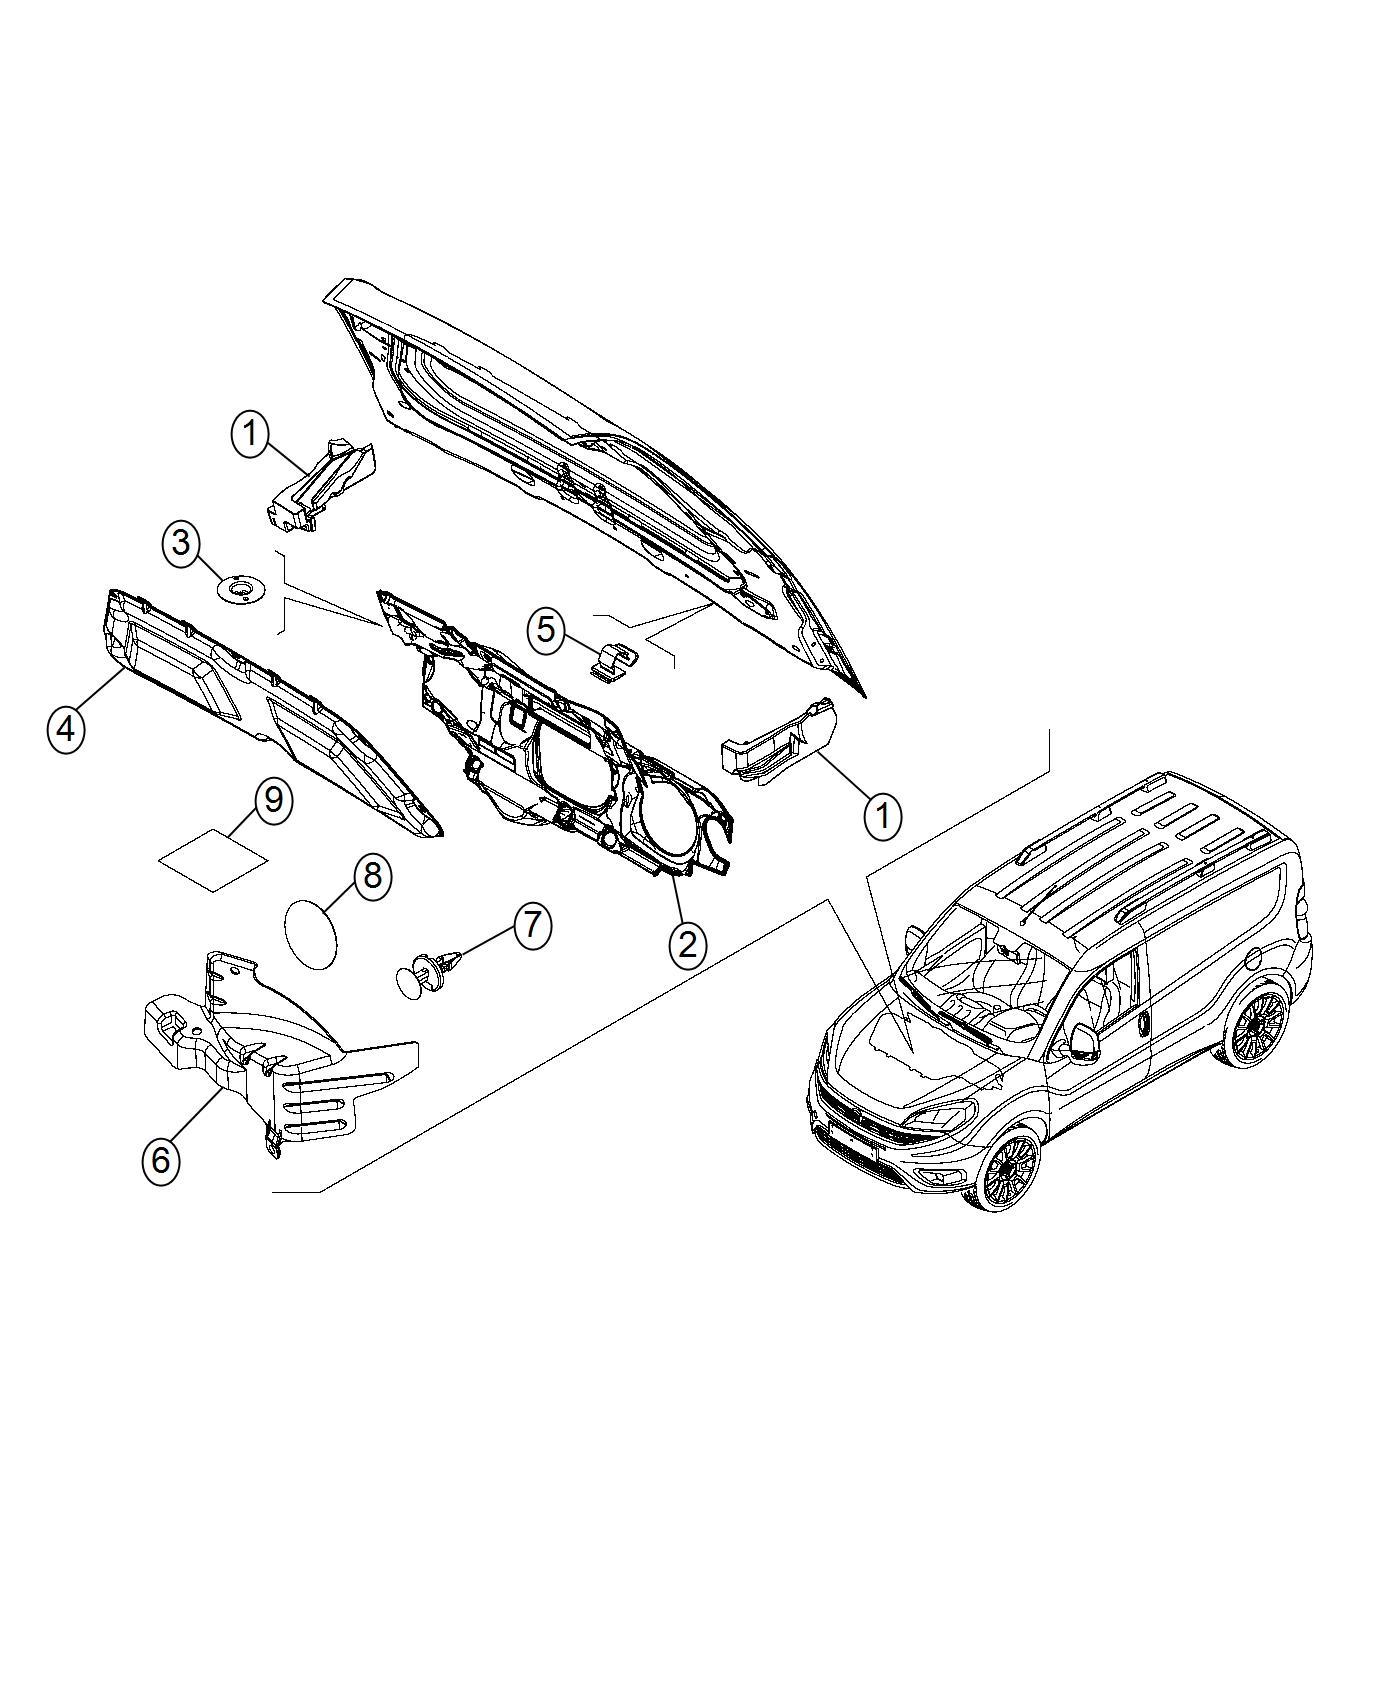 Ram Promaster City Wagon Heat Shield Dash Exhaust